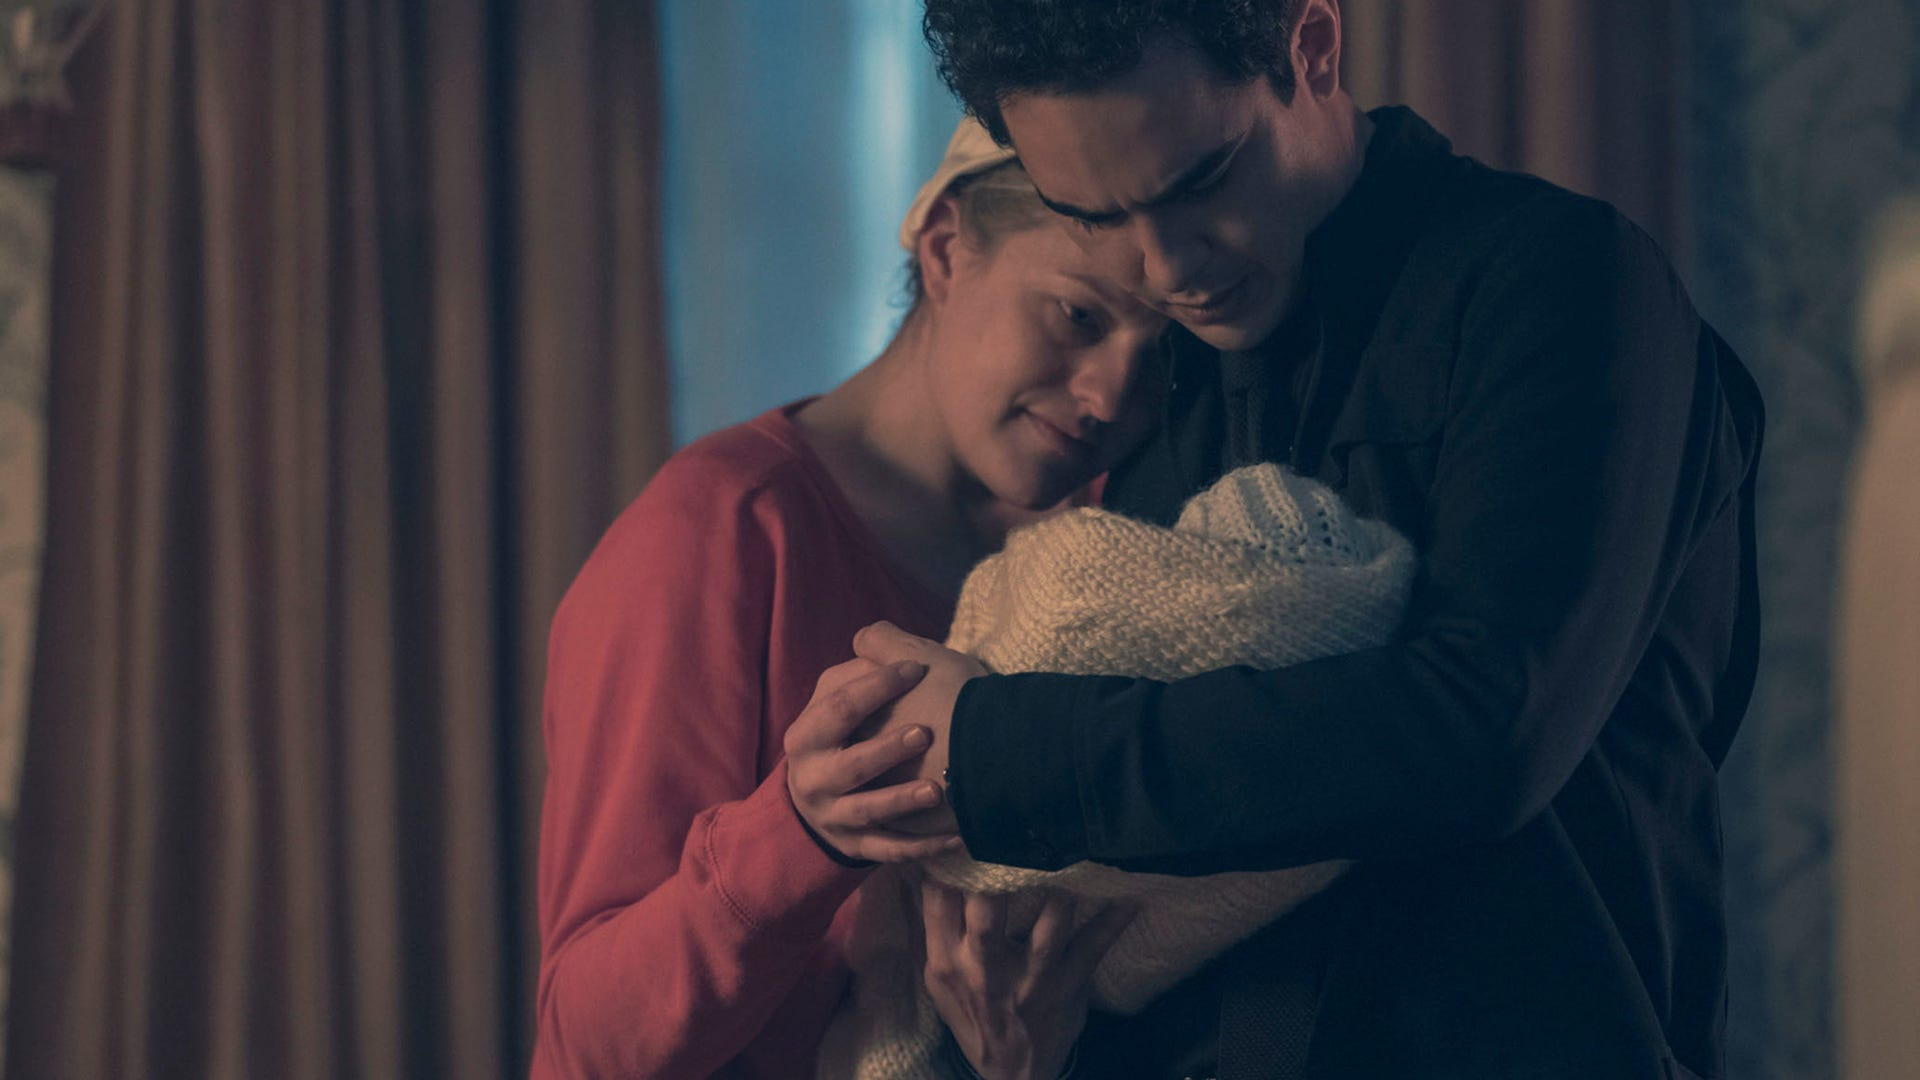 Elisabeth Moss) and Max Minghella, The Handmaid's Tale